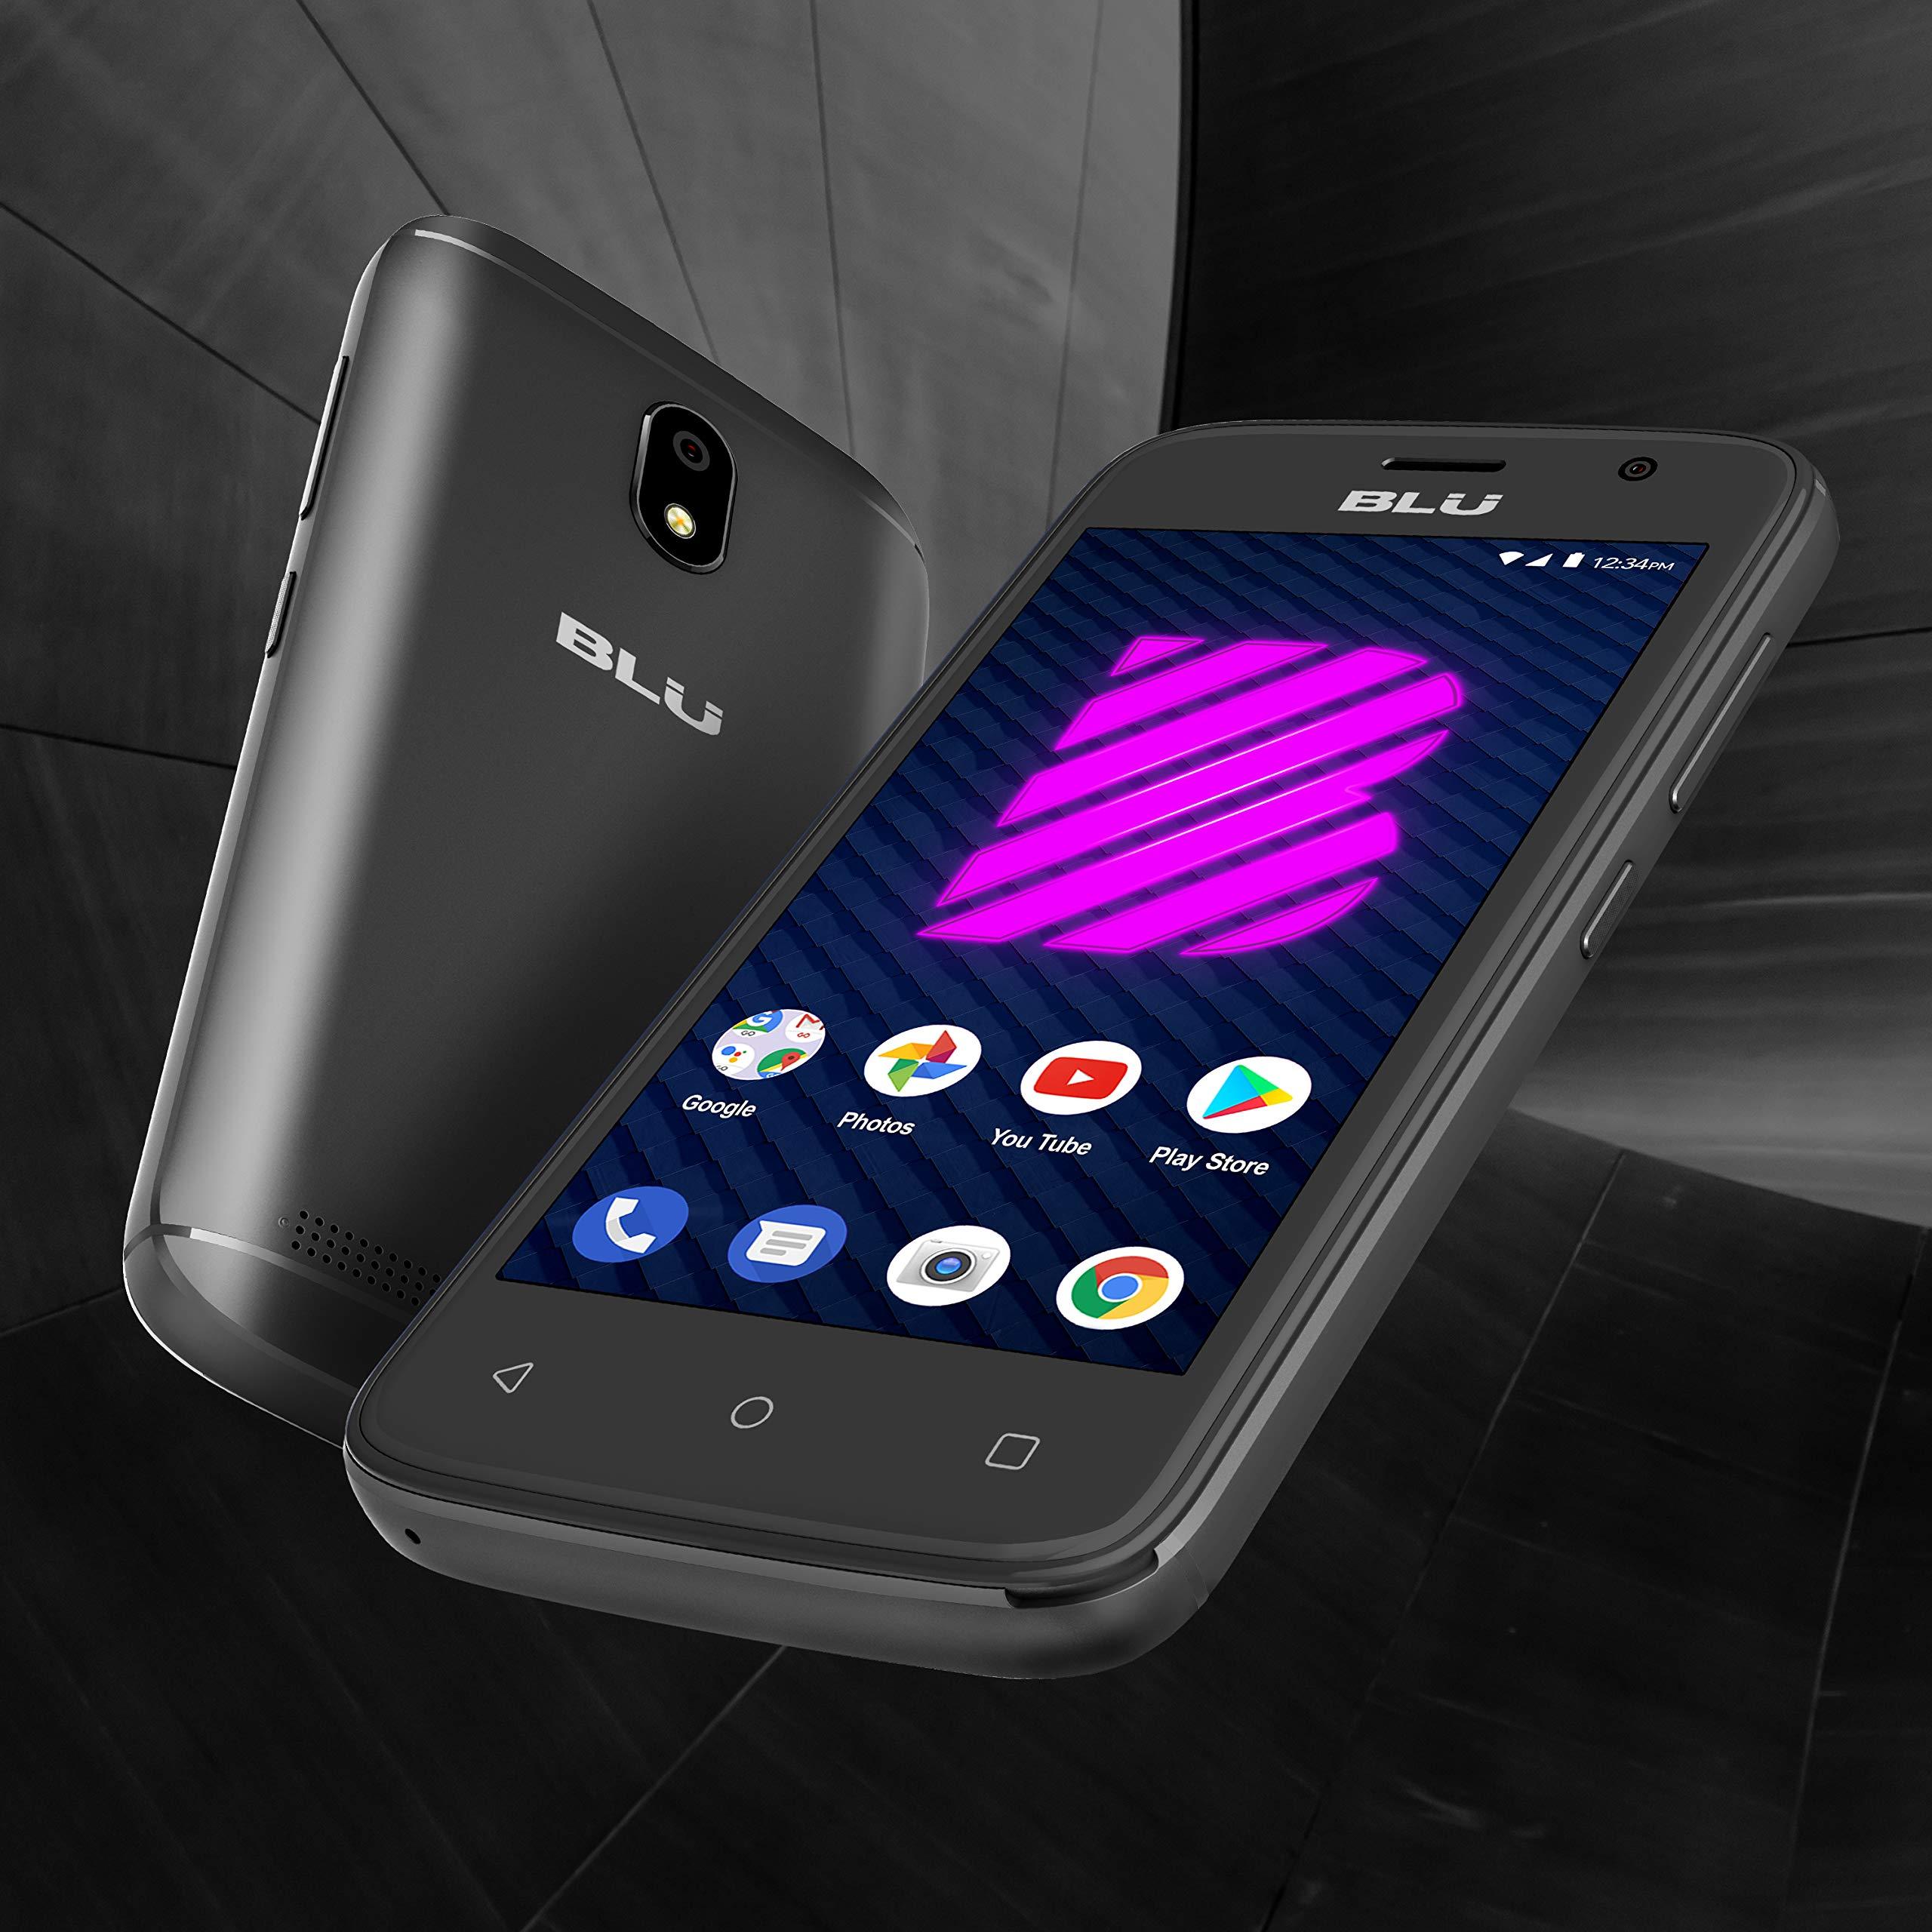 BLU Advance A4 -Unlocked Dual Sim Smartphone -Black by BLU (Image #6)